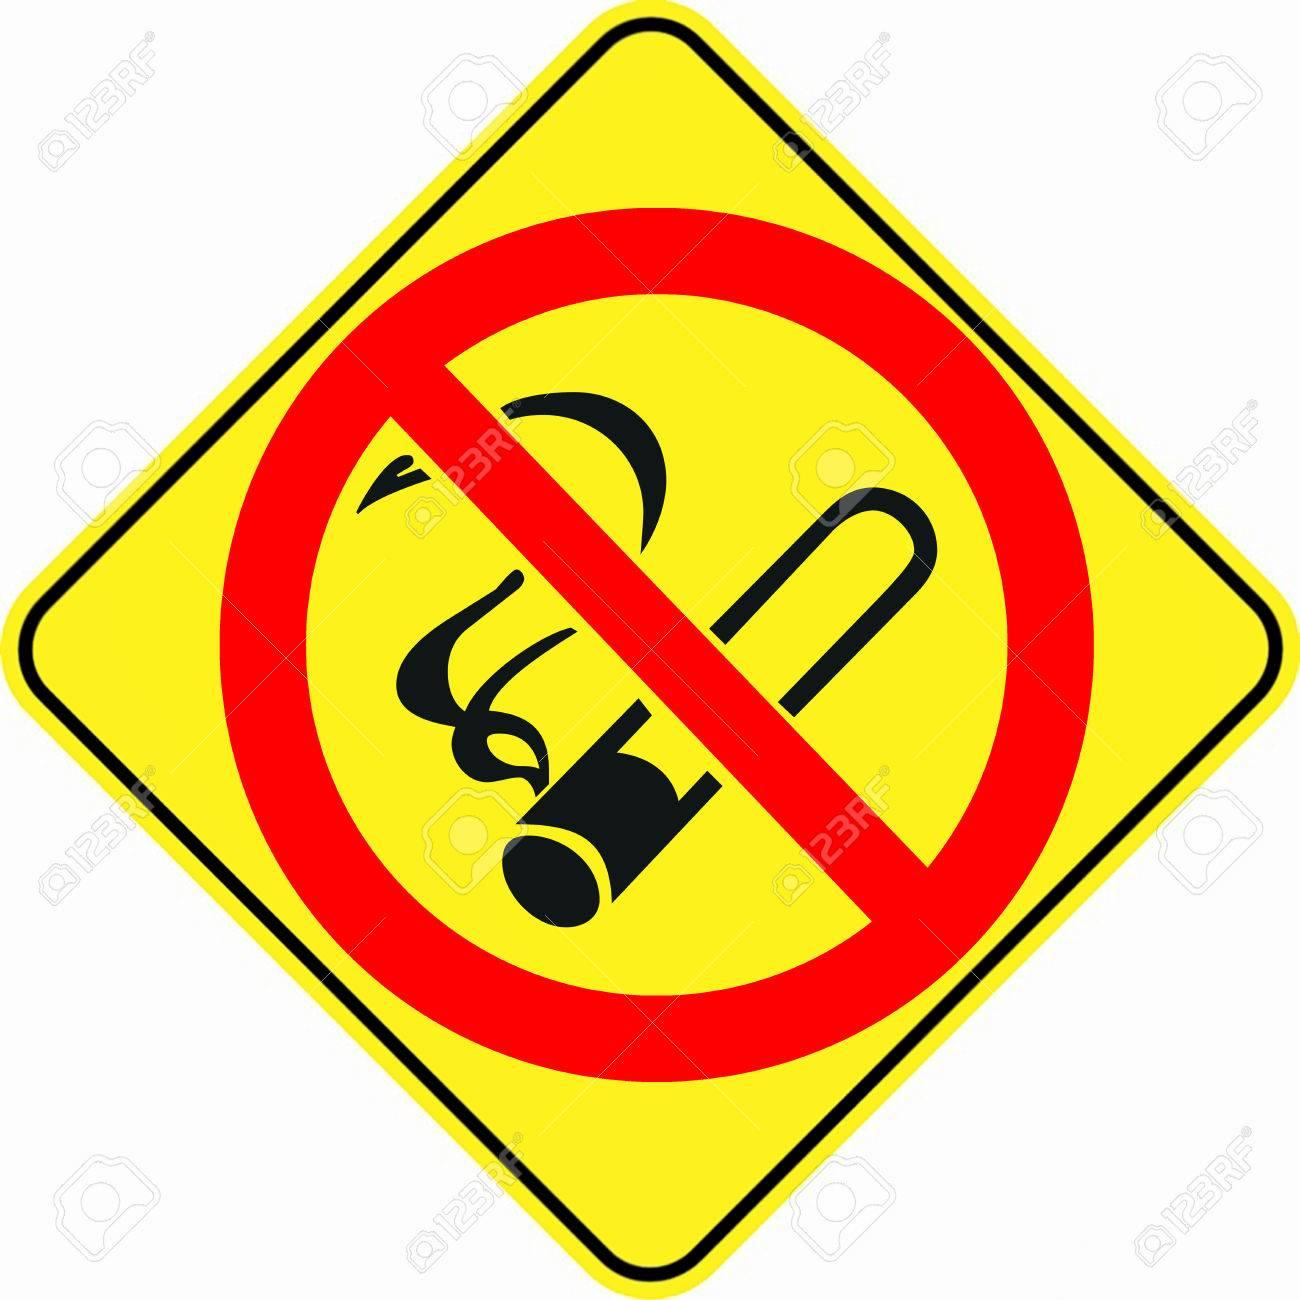 No smoking forbidden symbol sign stock photo picture and royalty no smoking forbidden symbol sign stock photo 76826520 biocorpaavc Image collections